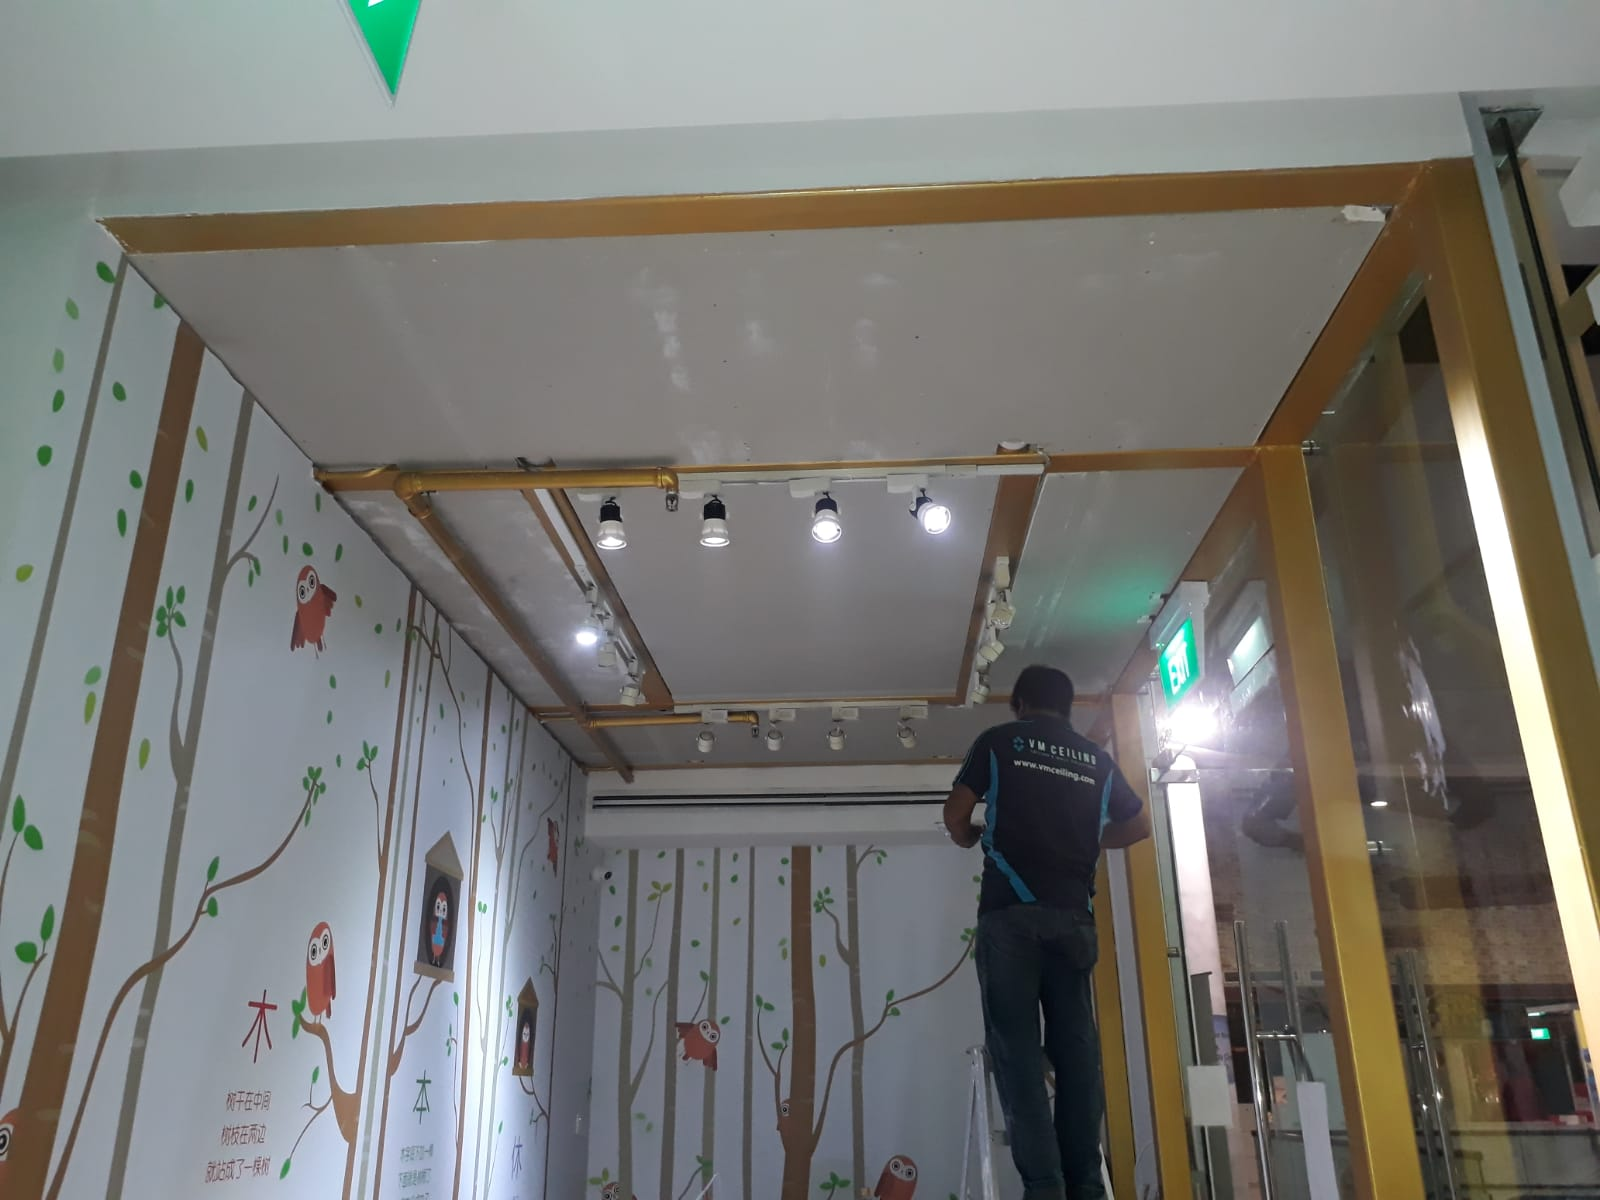 false-ceiling-installation-vm-ceiling-commercial-woodlands-singapore-1